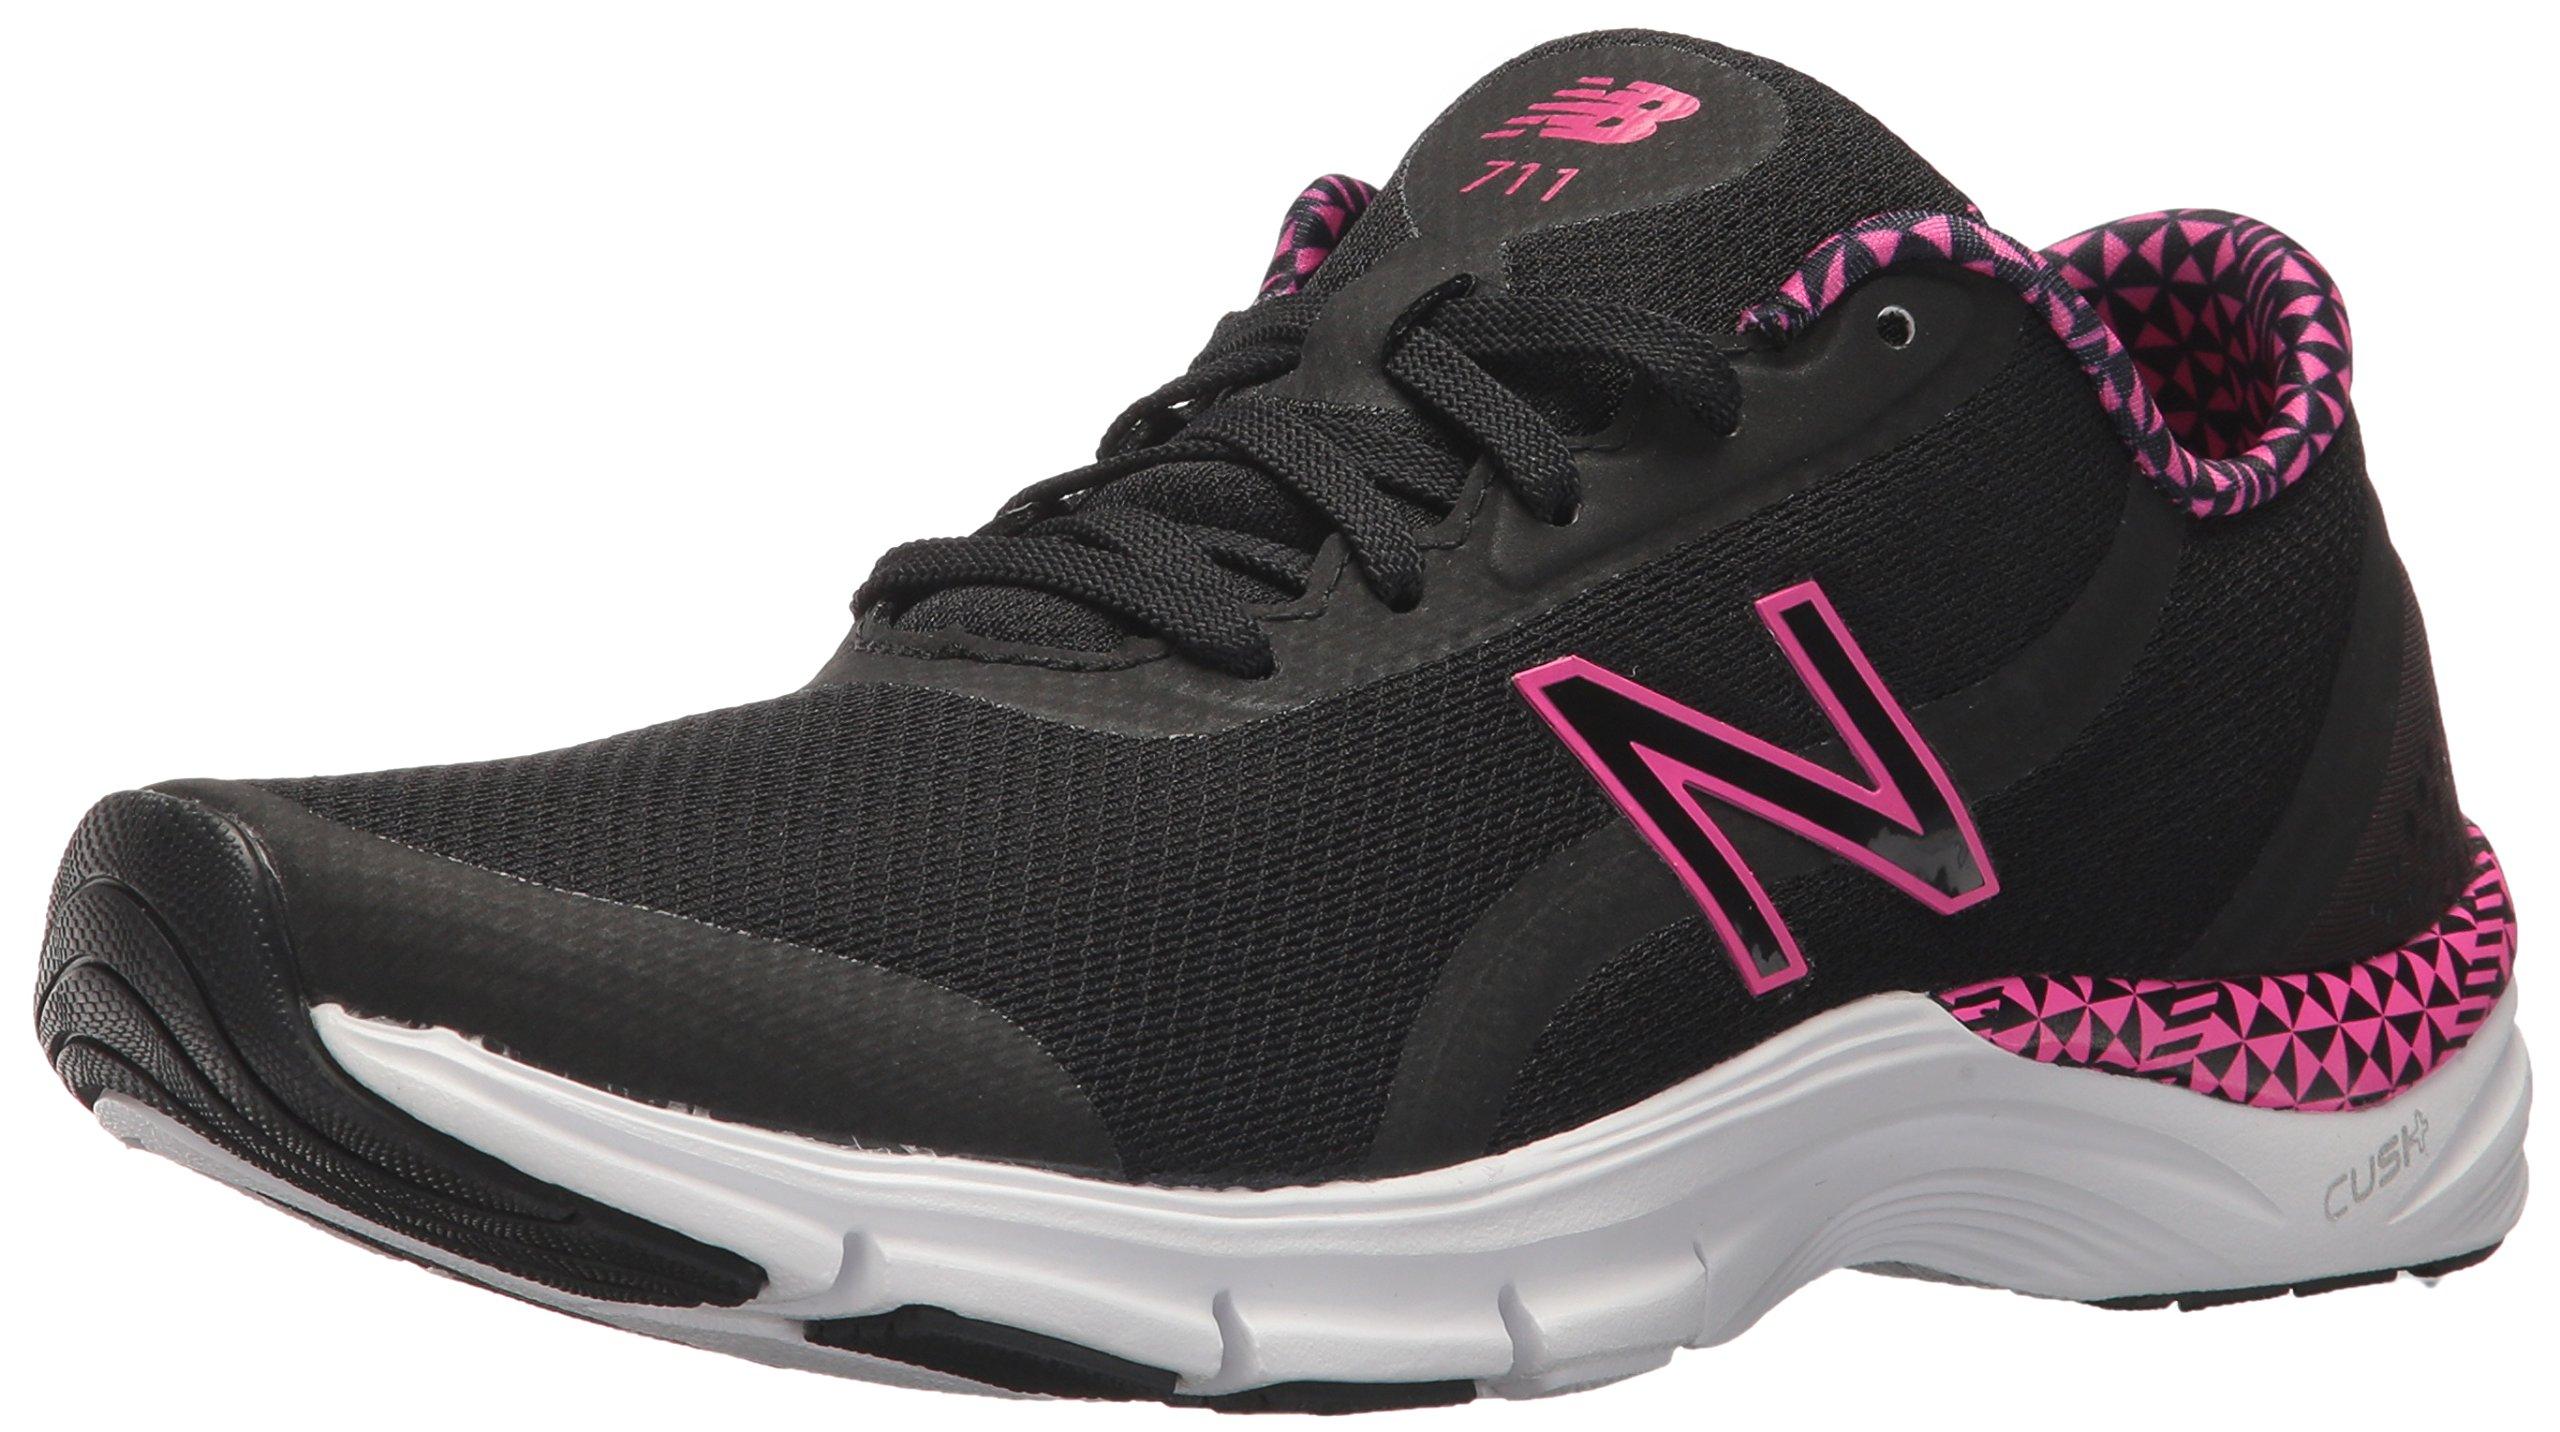 New Balance Women's 711v3 CUSH + Training Shoe, Black, 9 D US